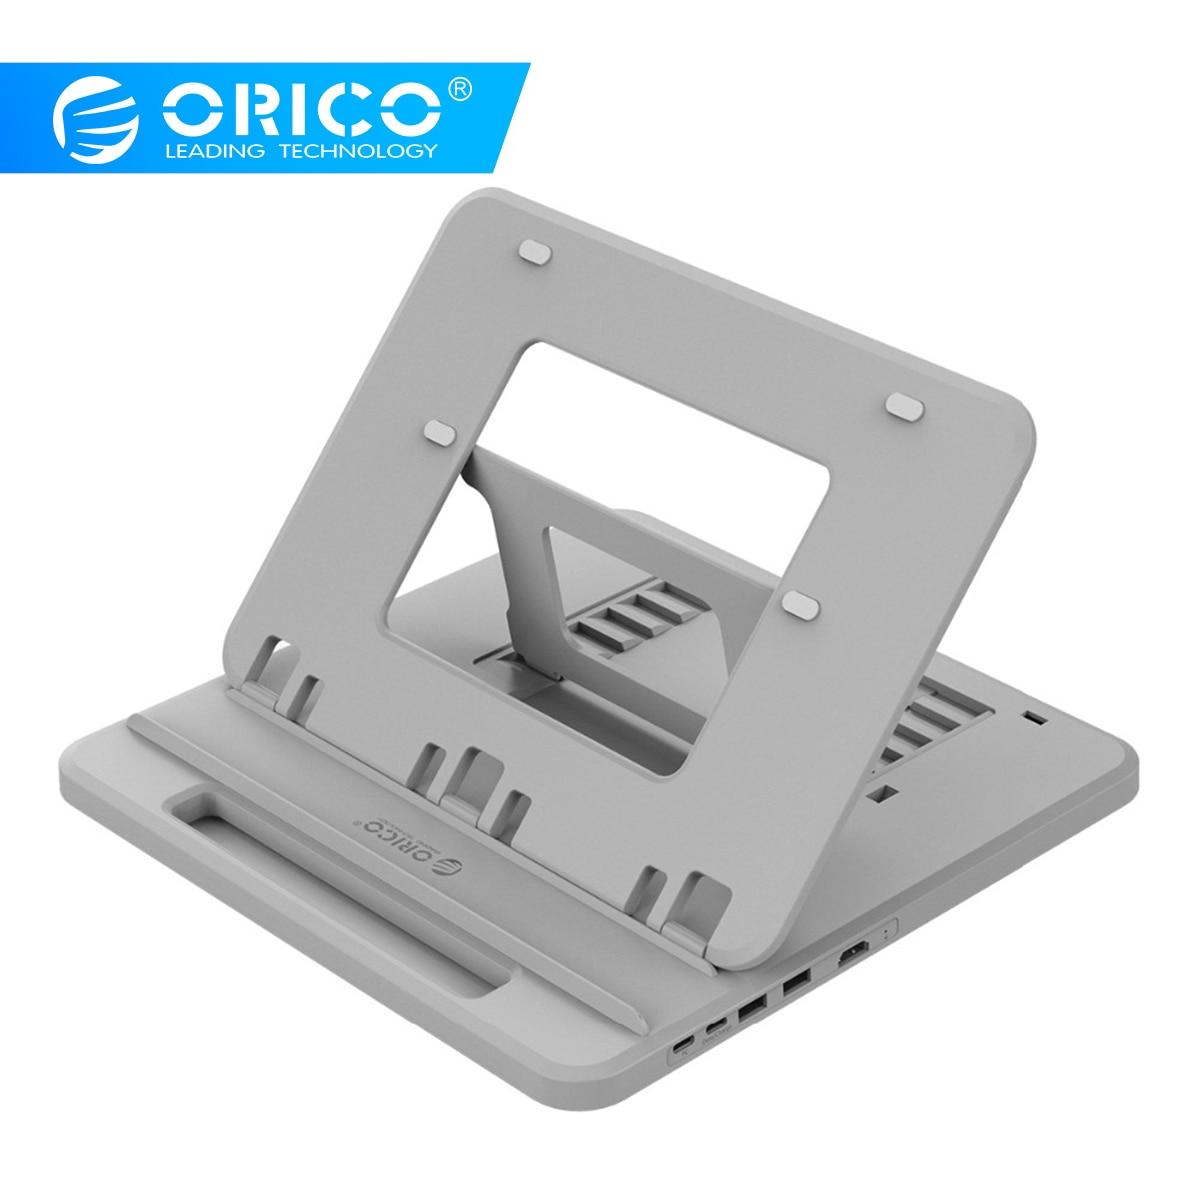 ORICO USB C HUB USB C to HDMI PD USB 3 0 HUB With Multi angle